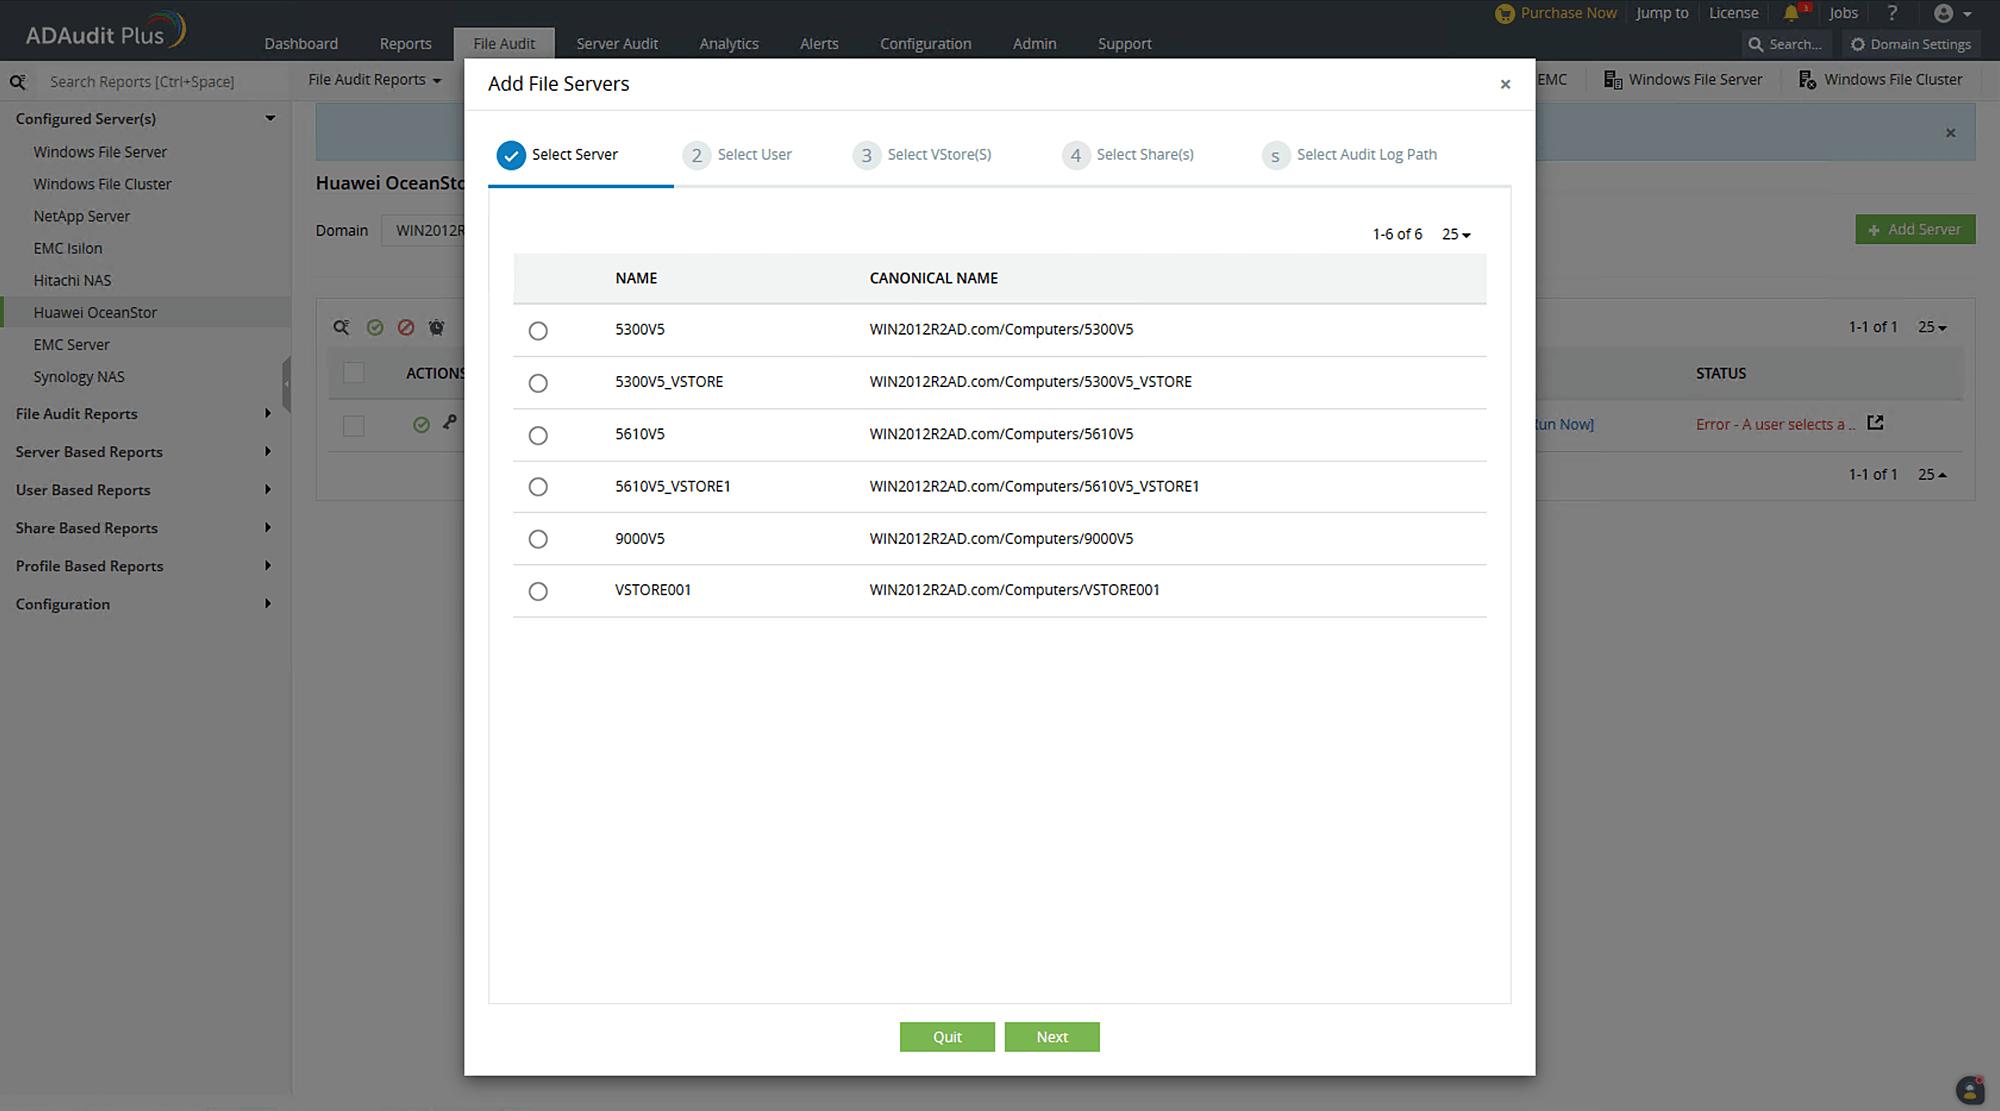 Adding Huawei OceanStor systems in ADAudit Plus